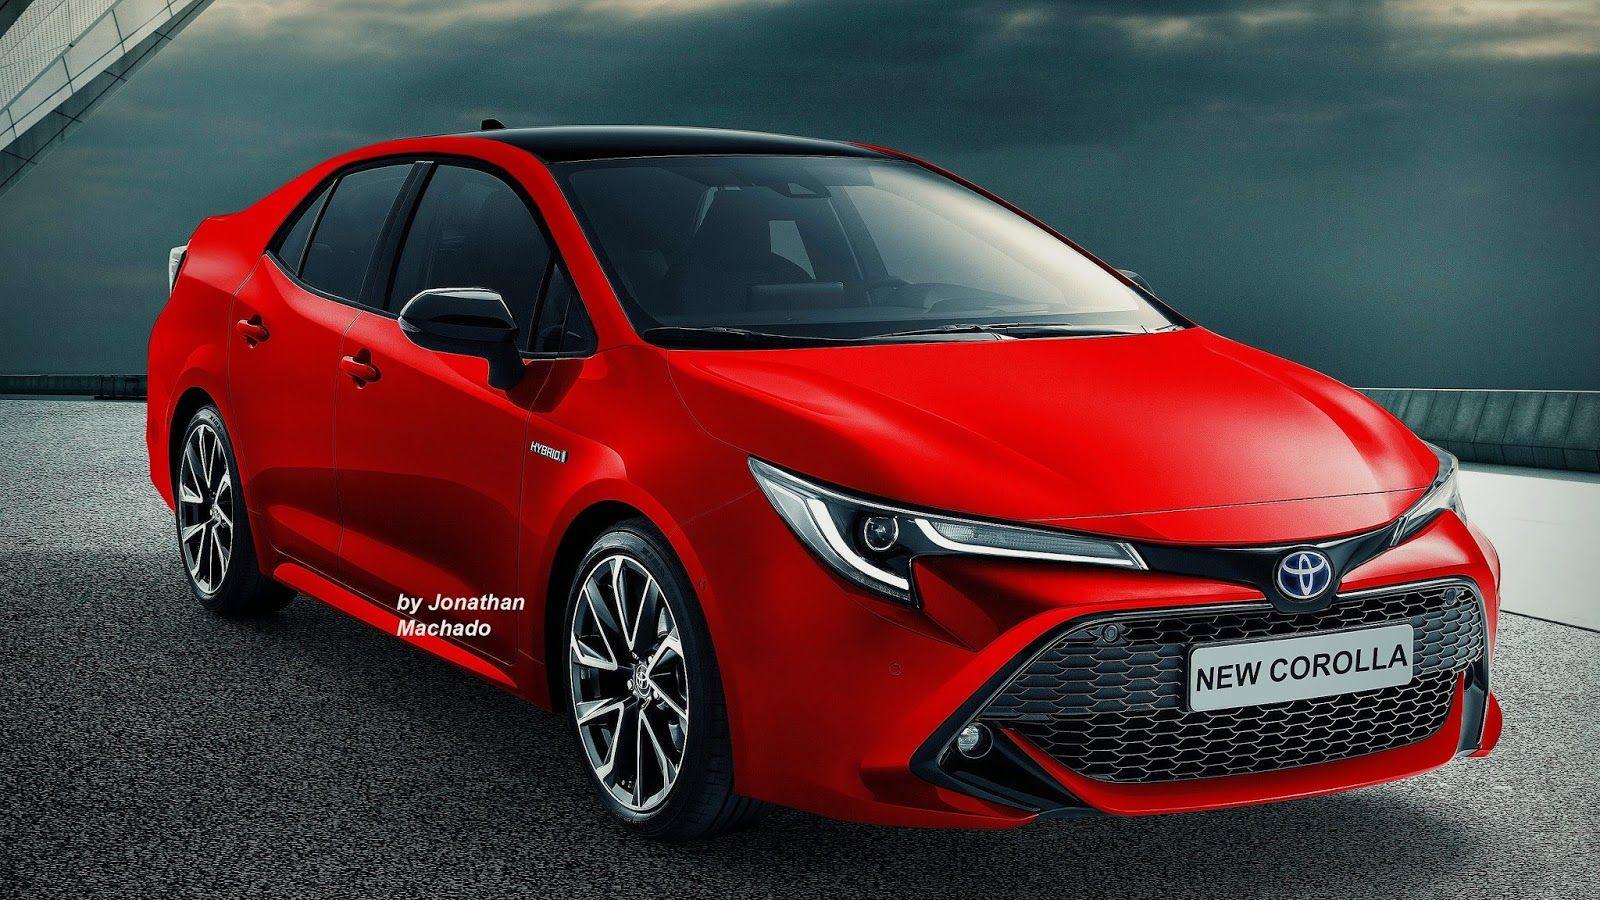 Next Gen 2019 Toyota Corolla Altis 2019 Toyota Corolla Sedan Imagined Toyota Corolla Toyota Avensis Toyota